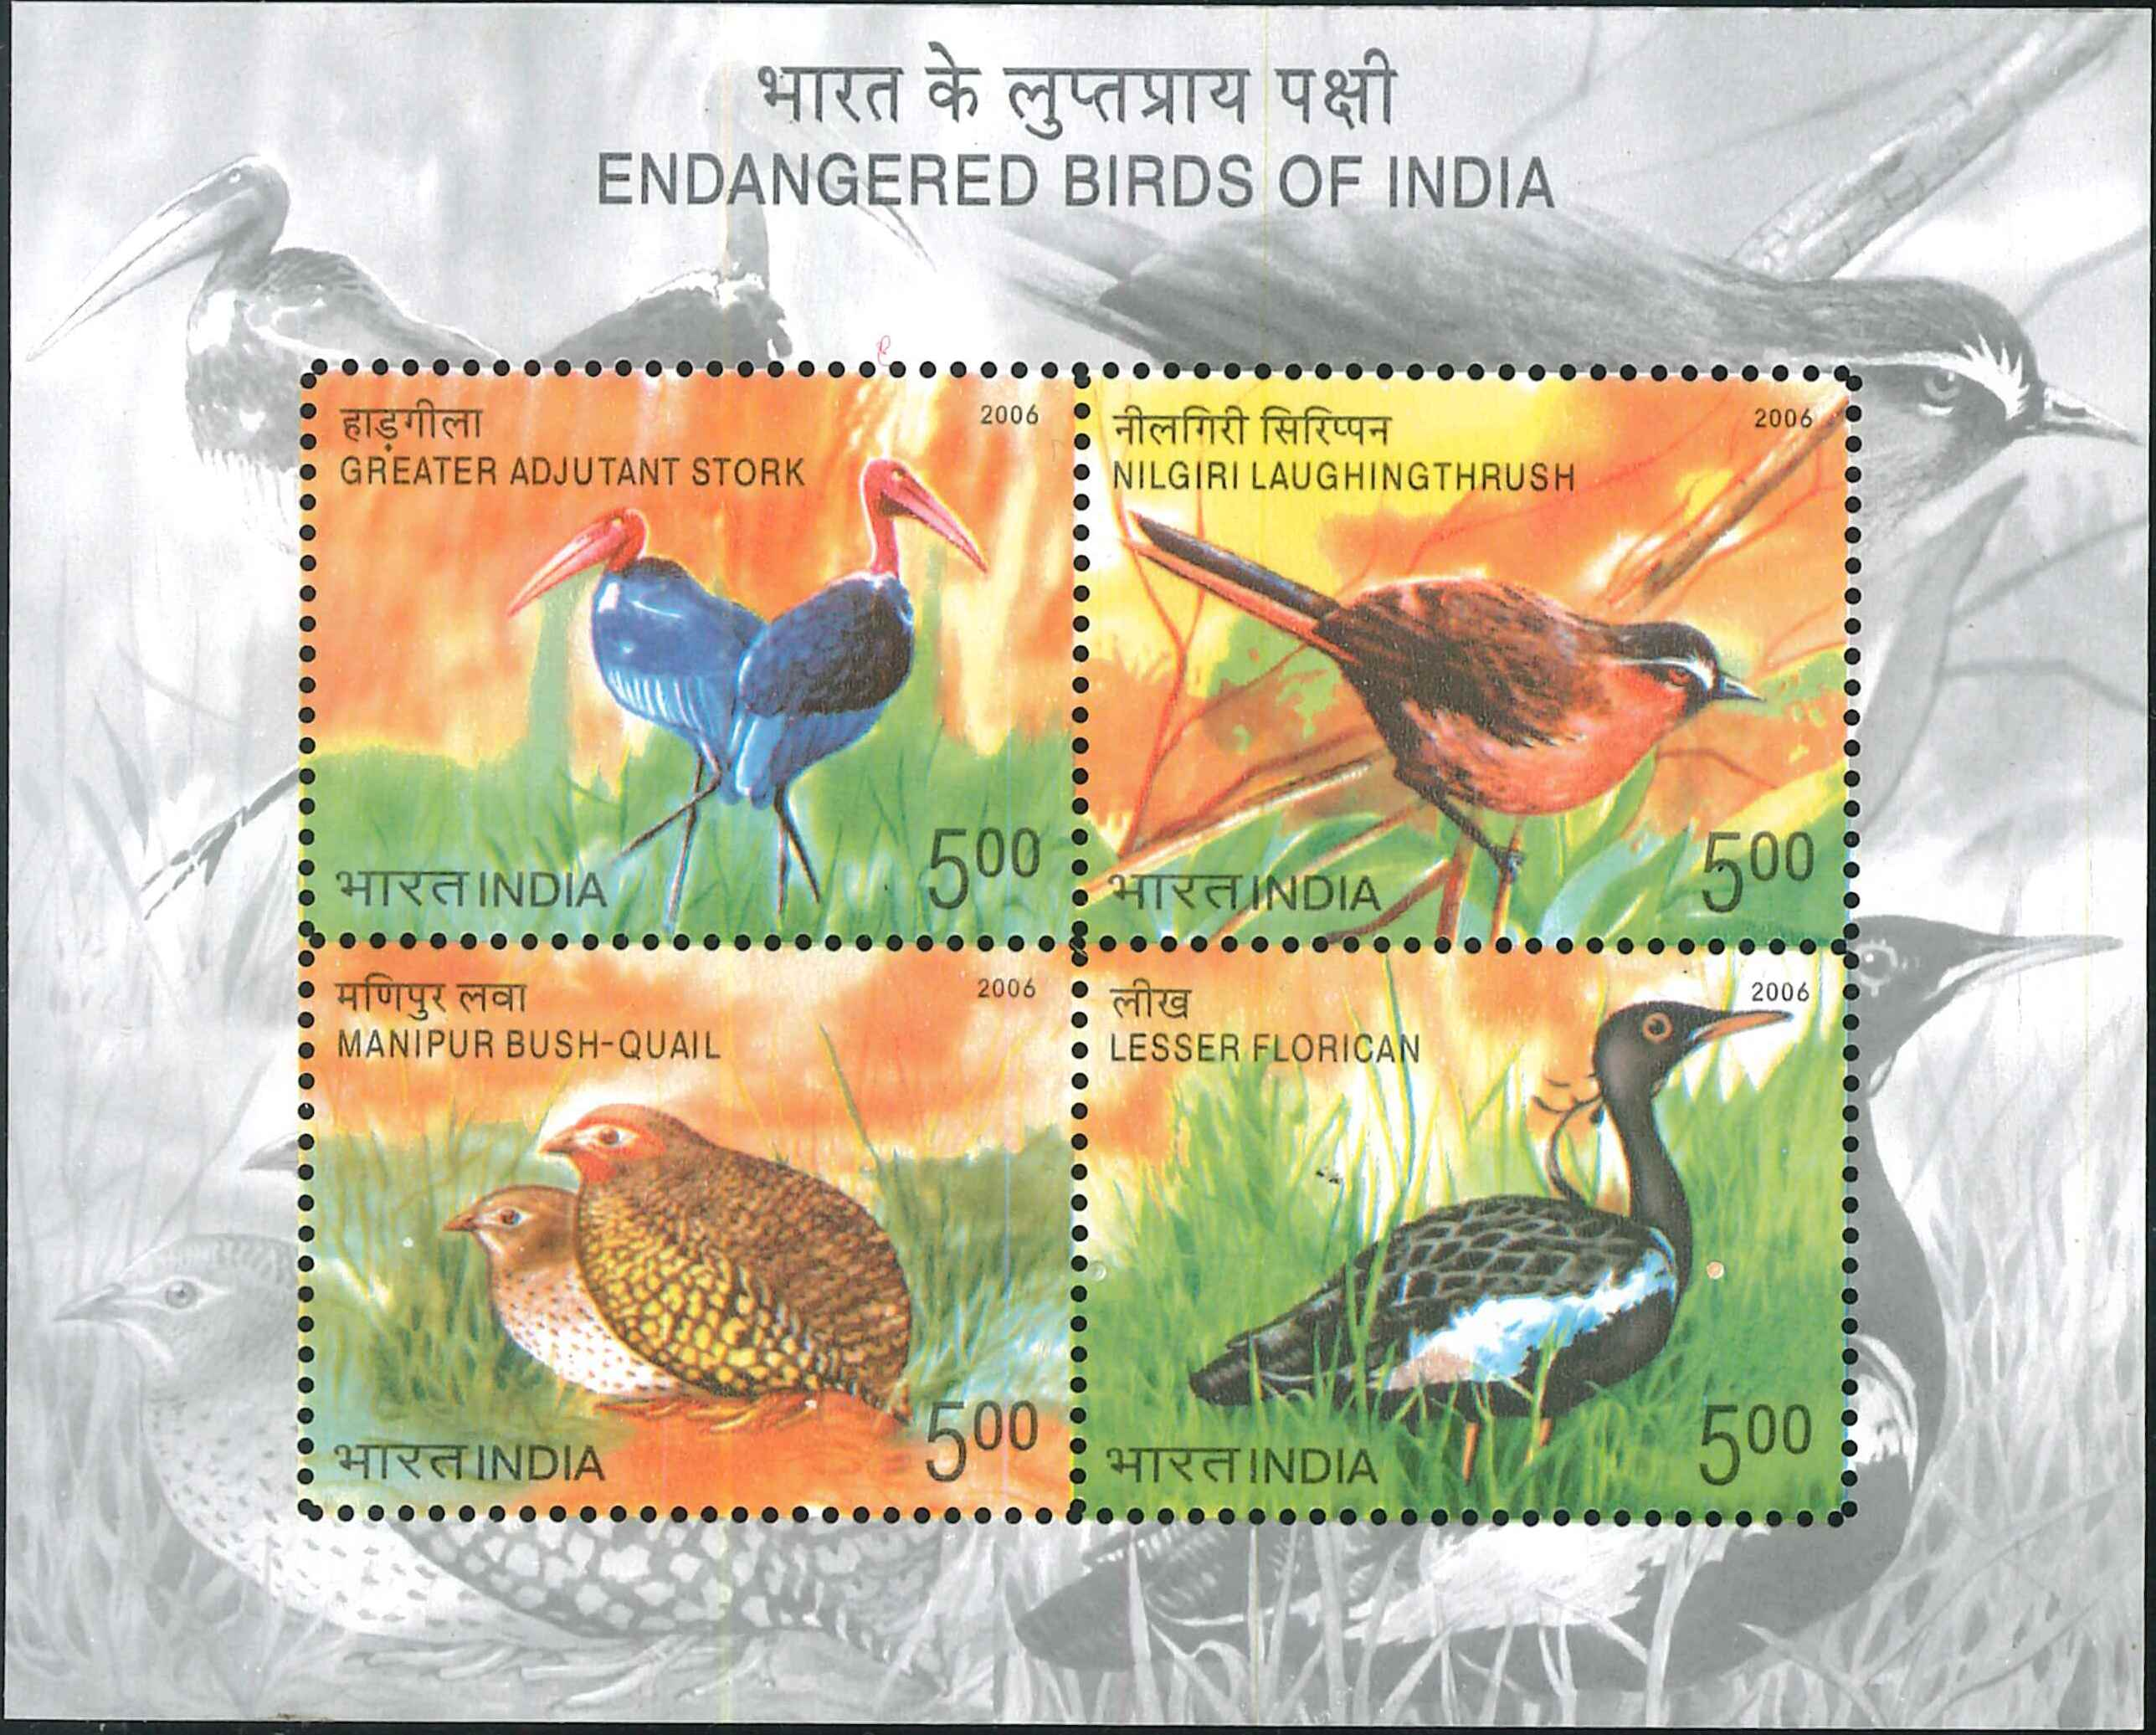 Manipur bush quail, Kharmore, Greater adjutant and Nilgiri laughingthrush